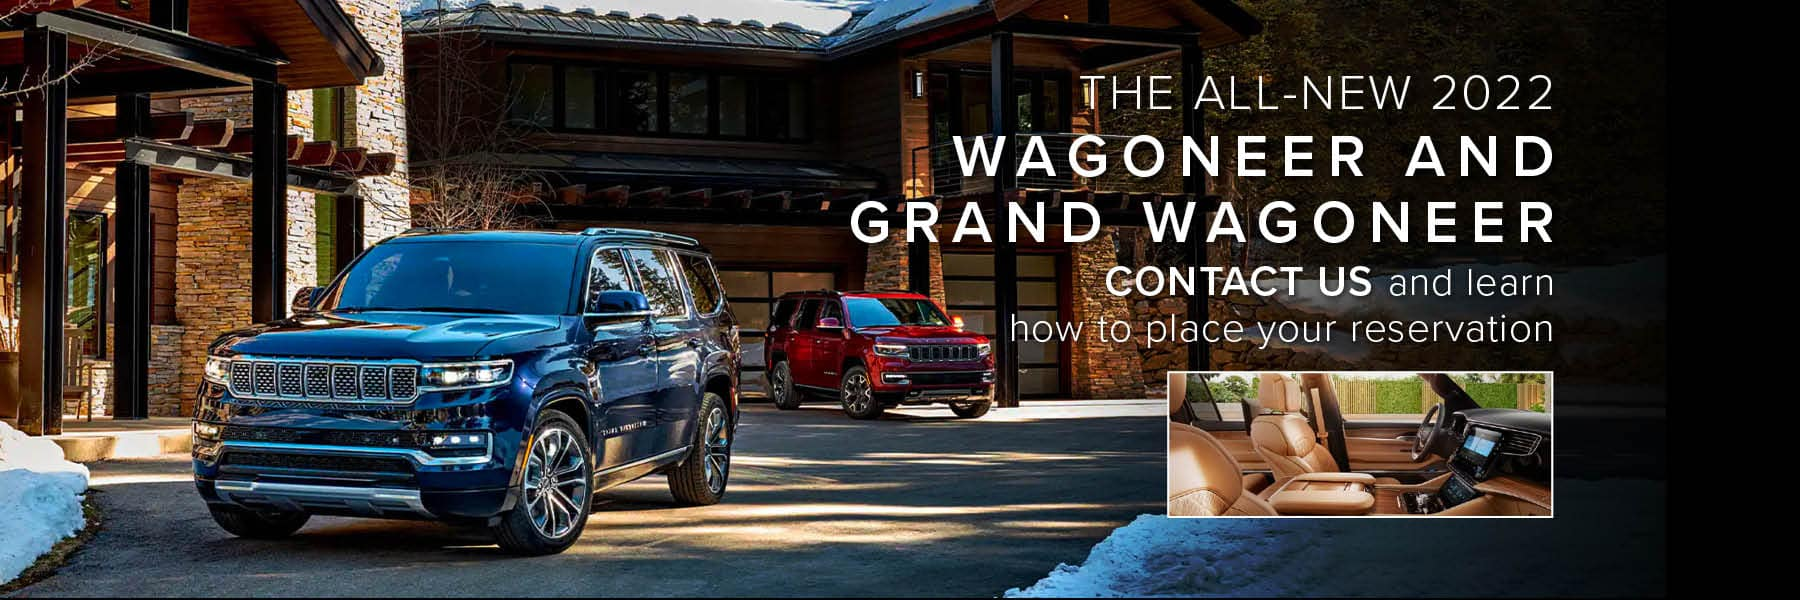 Wagoneer and Grand Wagoneer